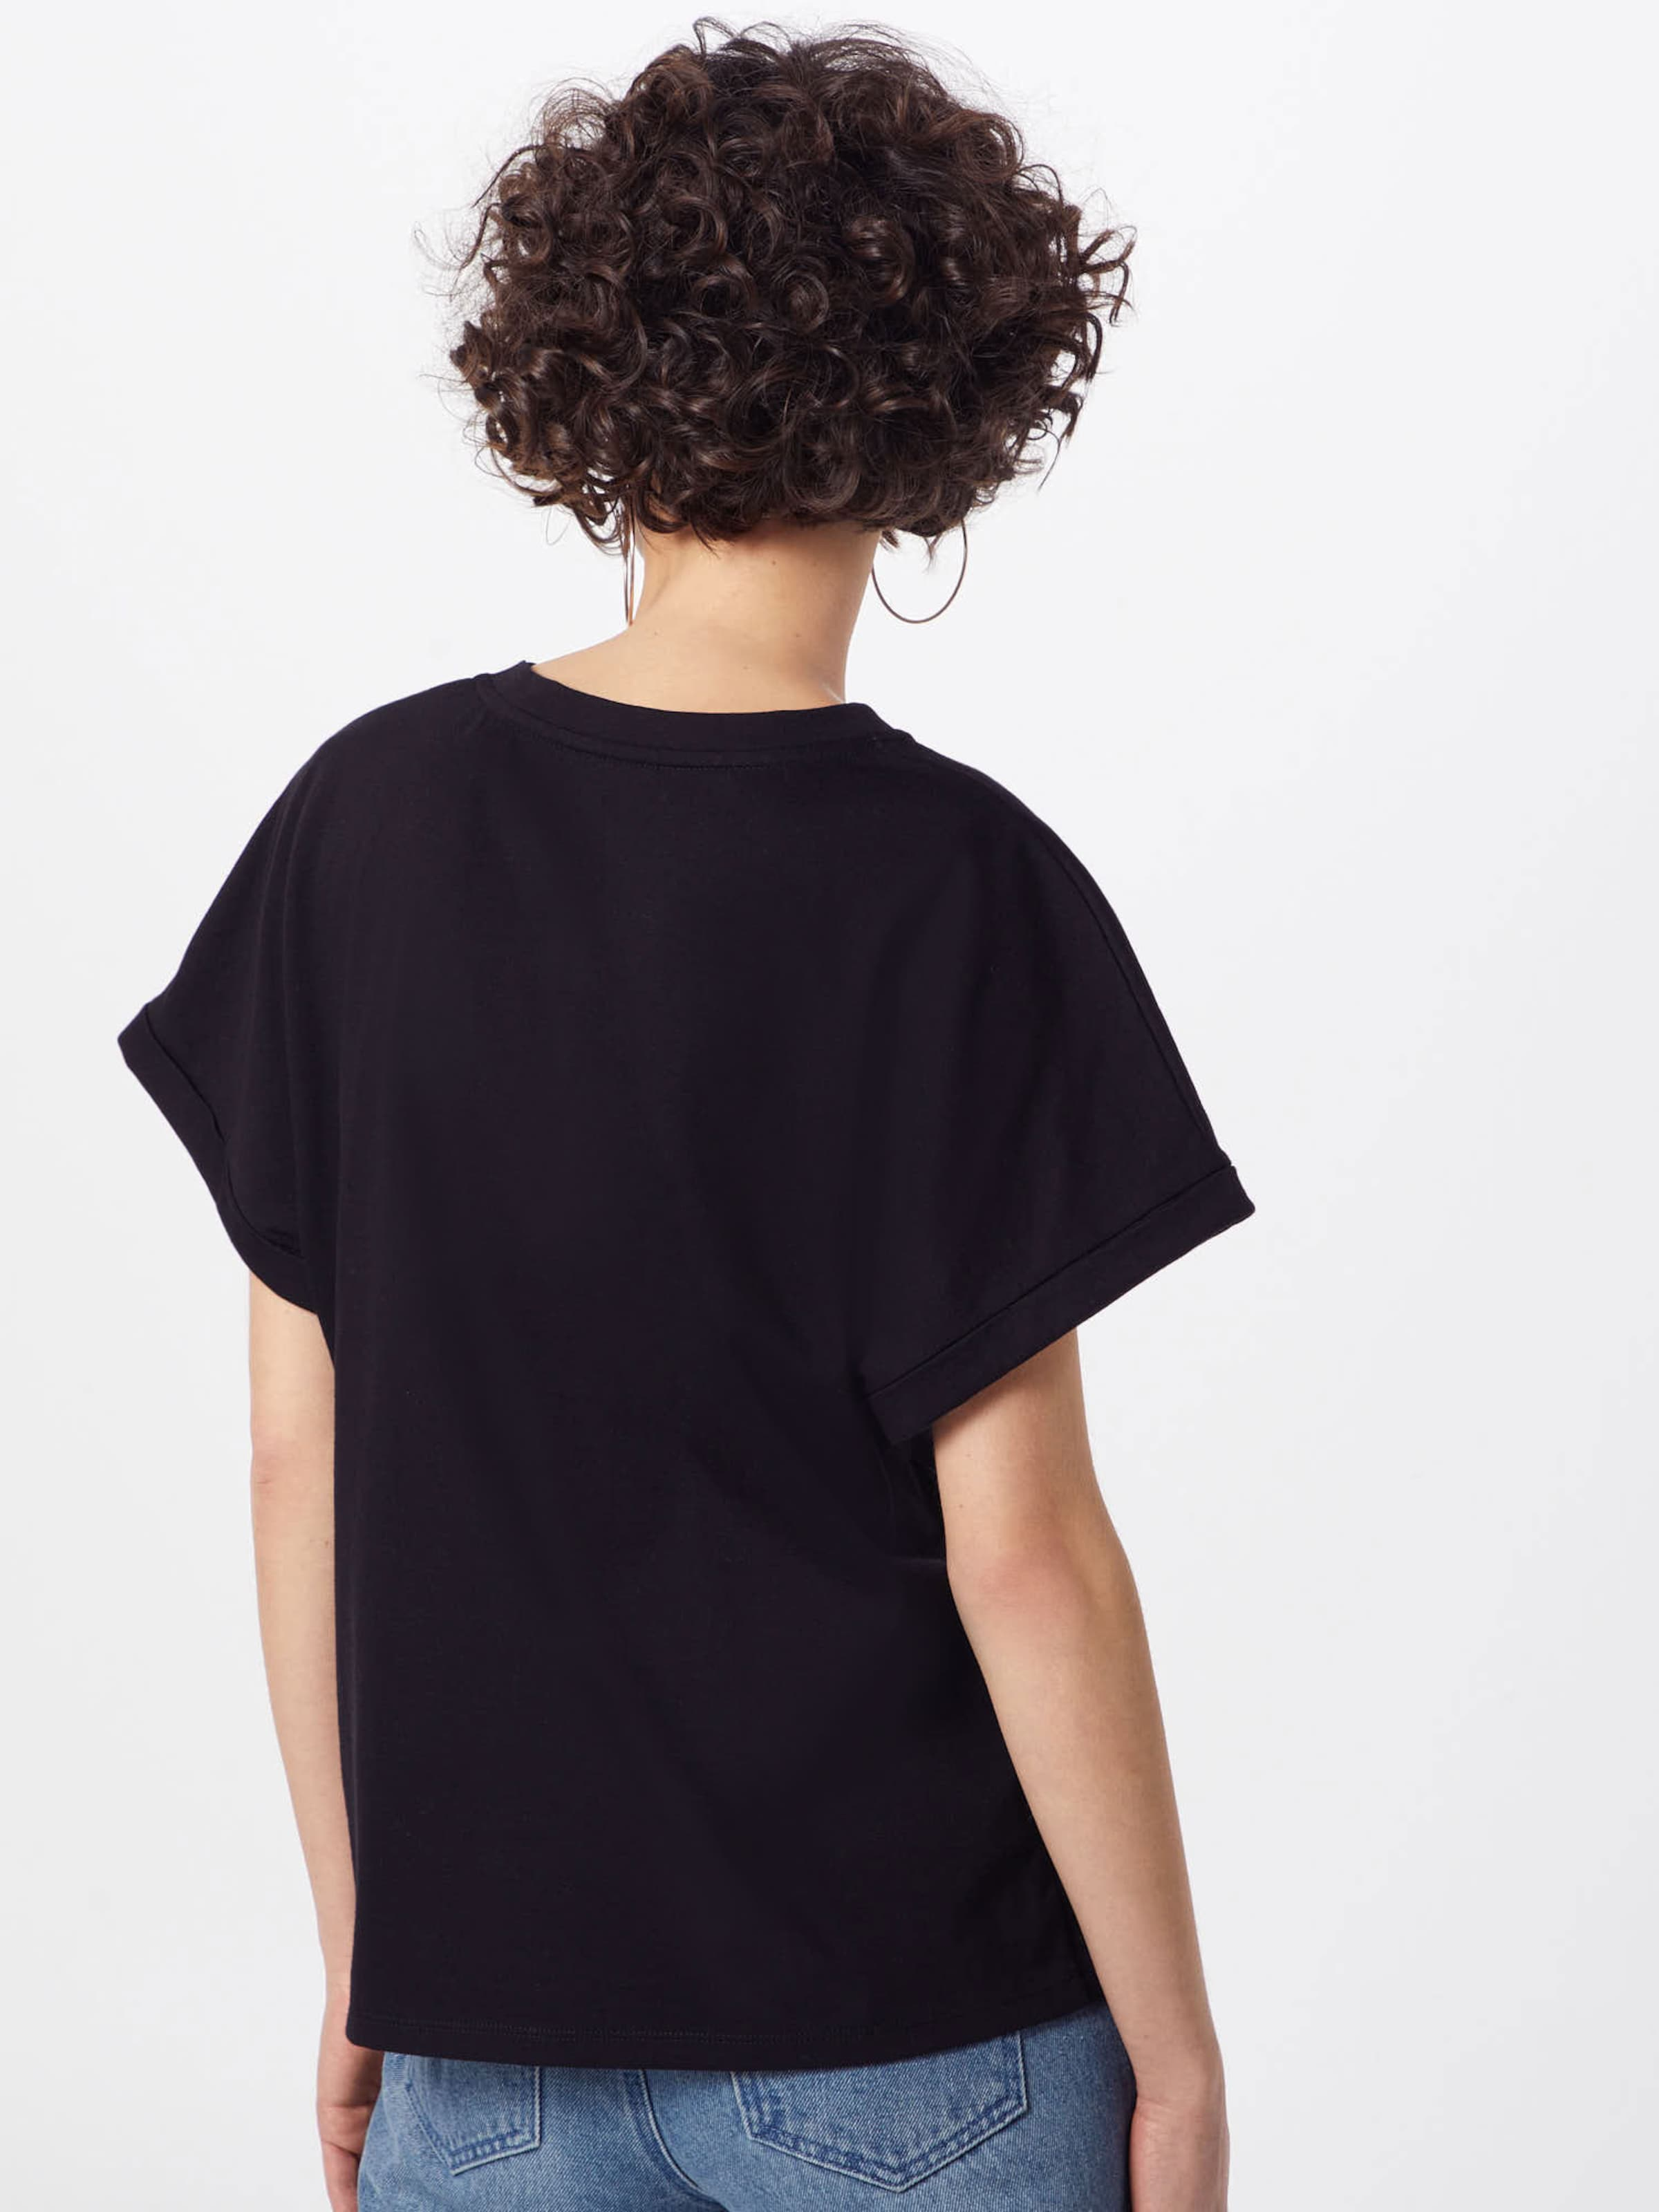 Disney Xt 'mira' shirt En Noir Lj43RqSc5A